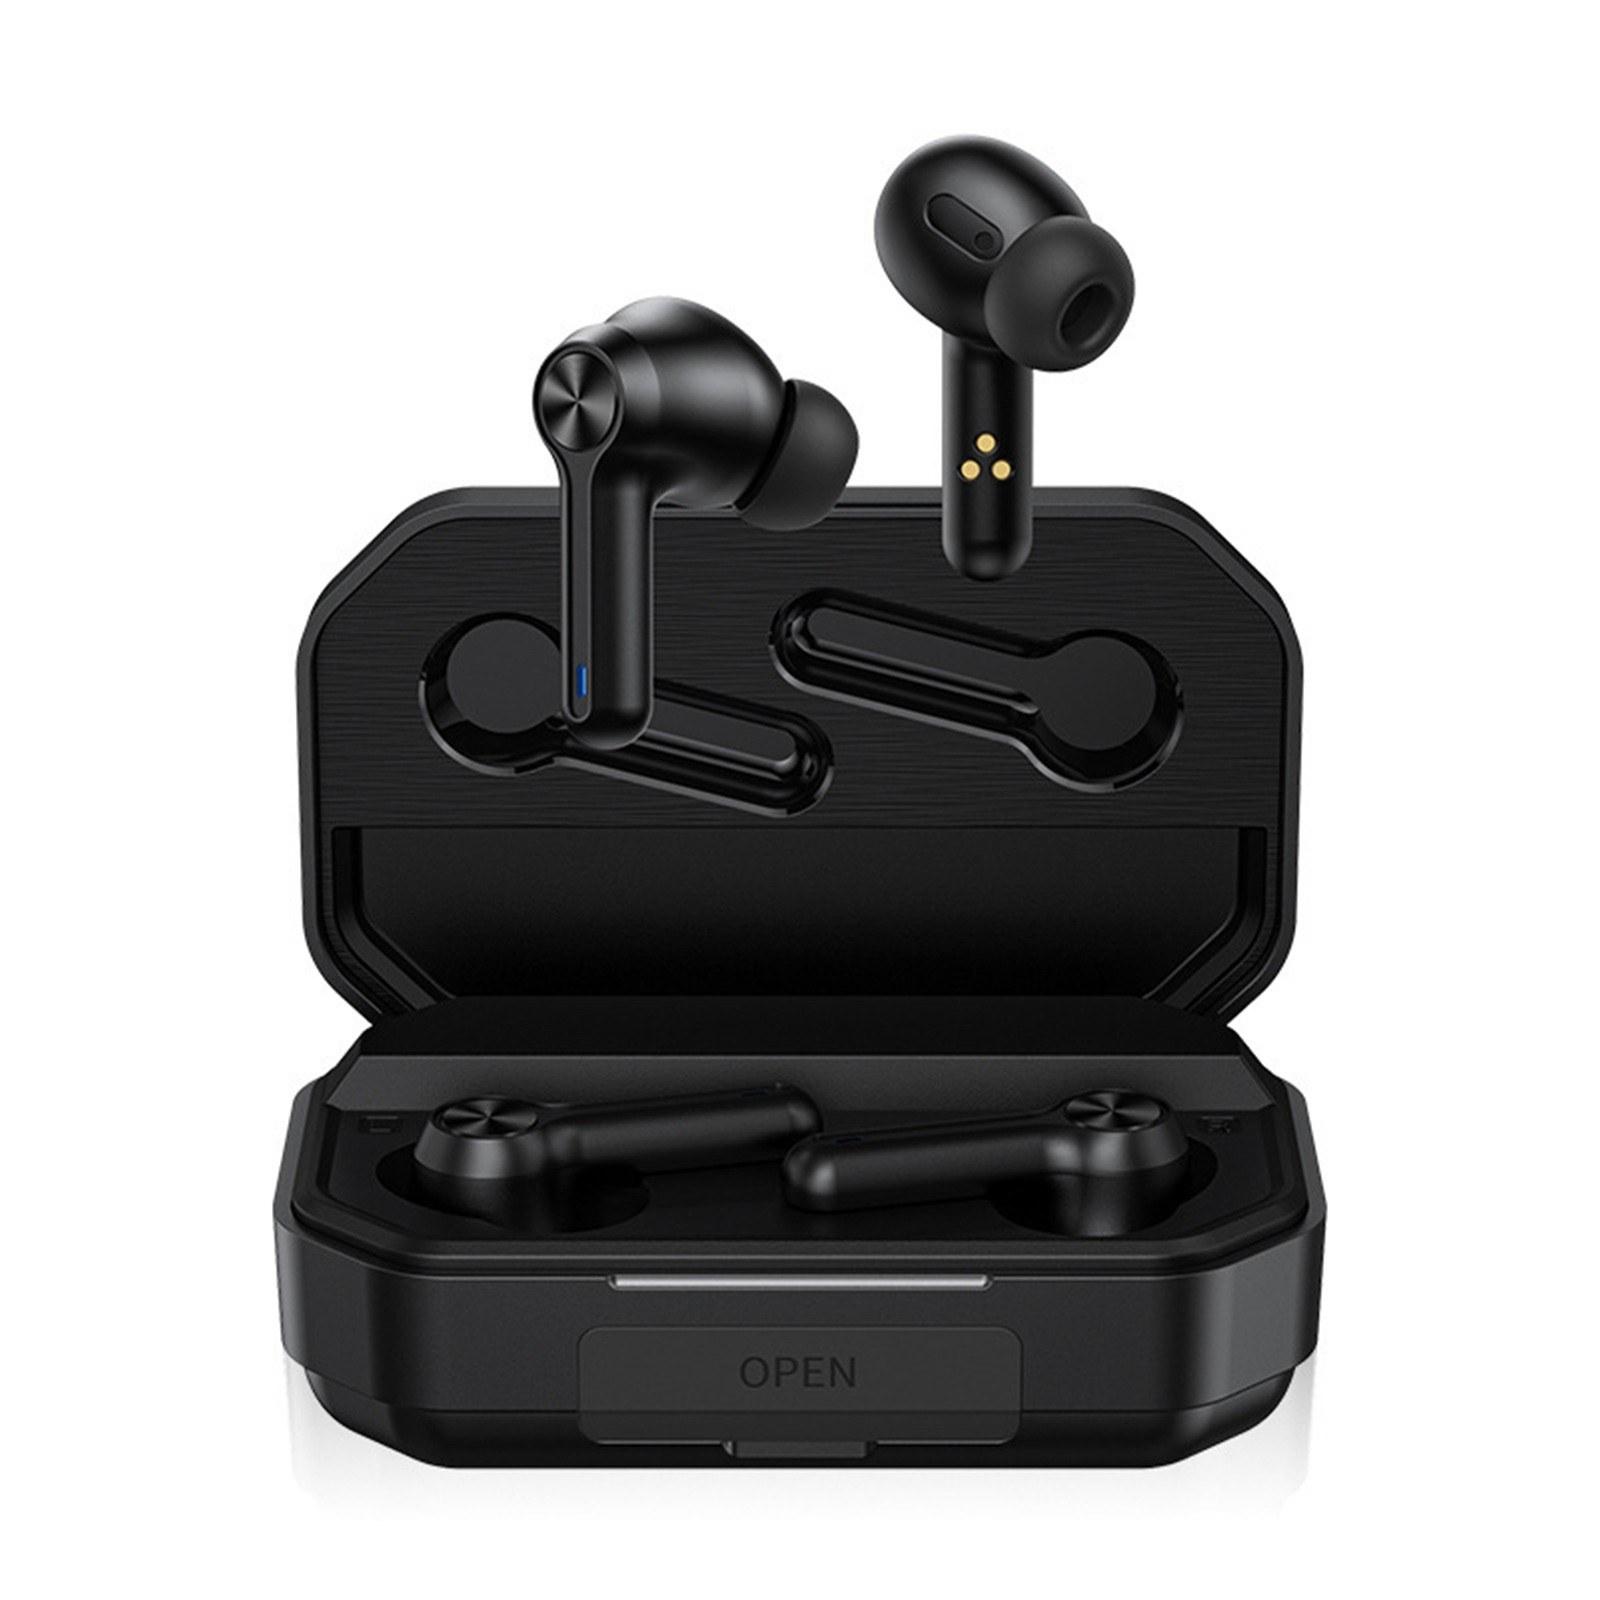 cafago.com - 53% OFF Lenovo LP3 Pro TWS Earphones Bluetooth 5.0 Wireless Earphones,free shipping+$20.90